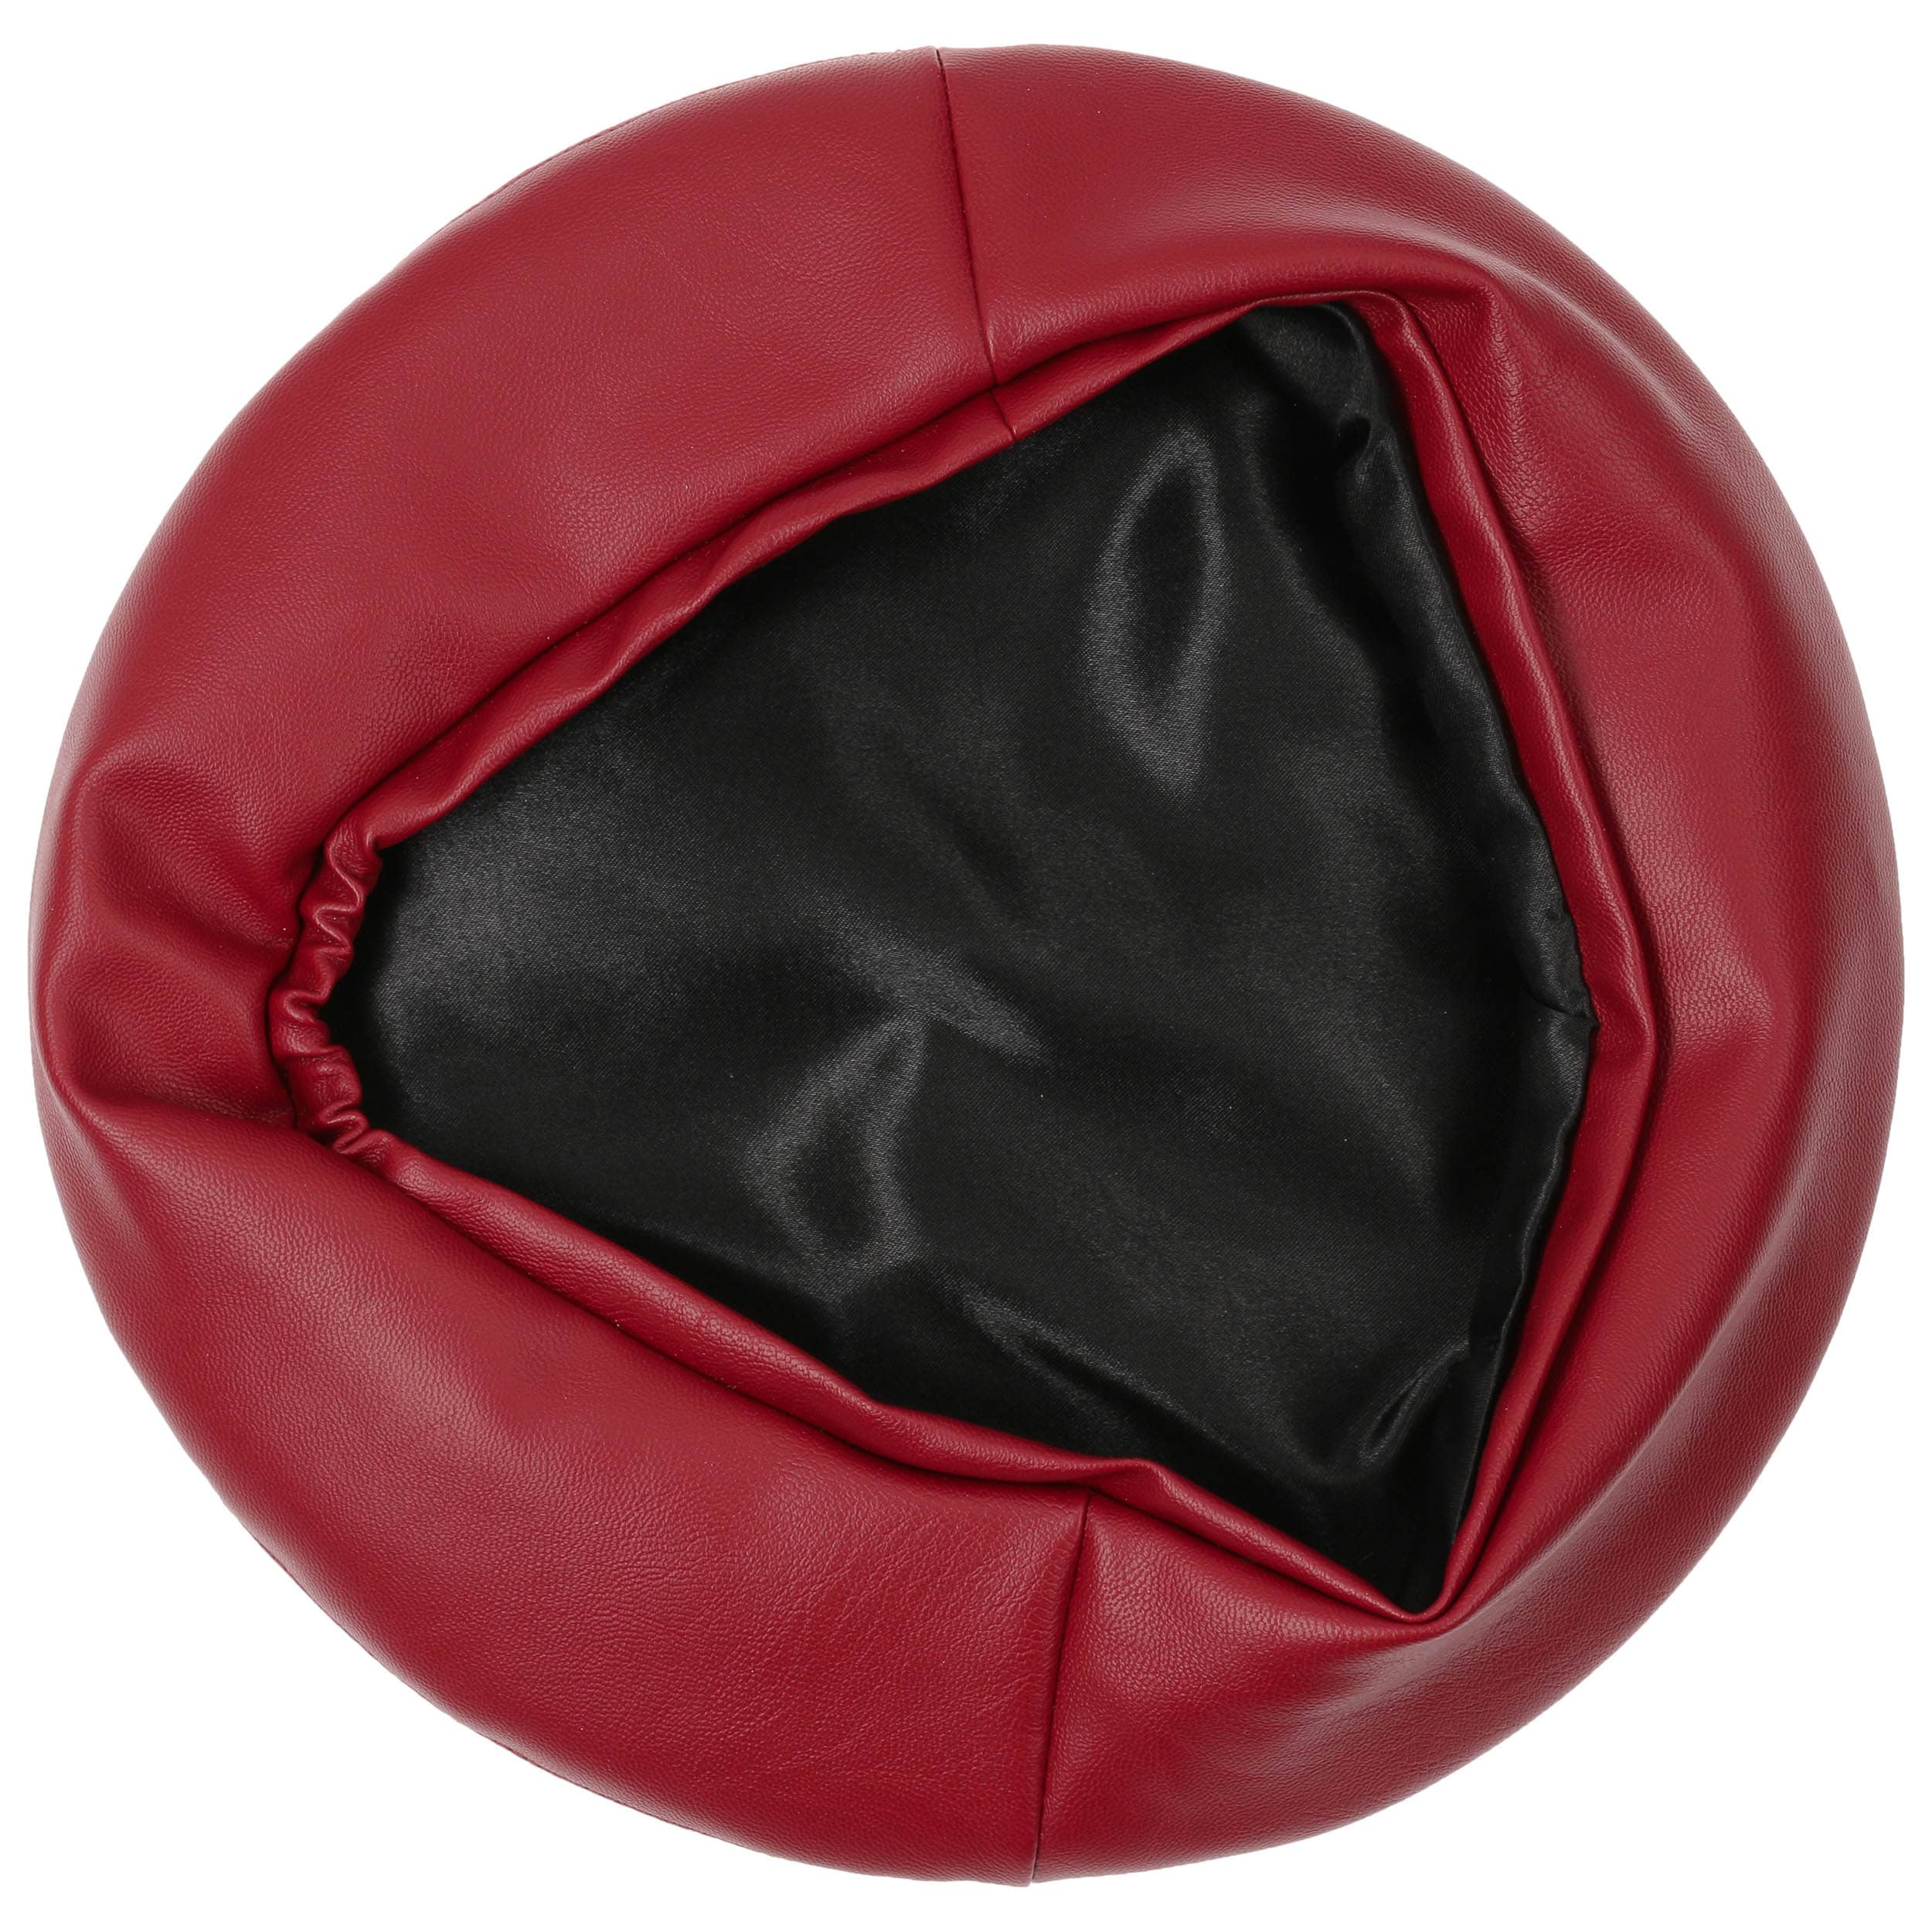 b23bc89df71a1 ... Faux Leather Beret by Lipodo - bordeaux 2 ...